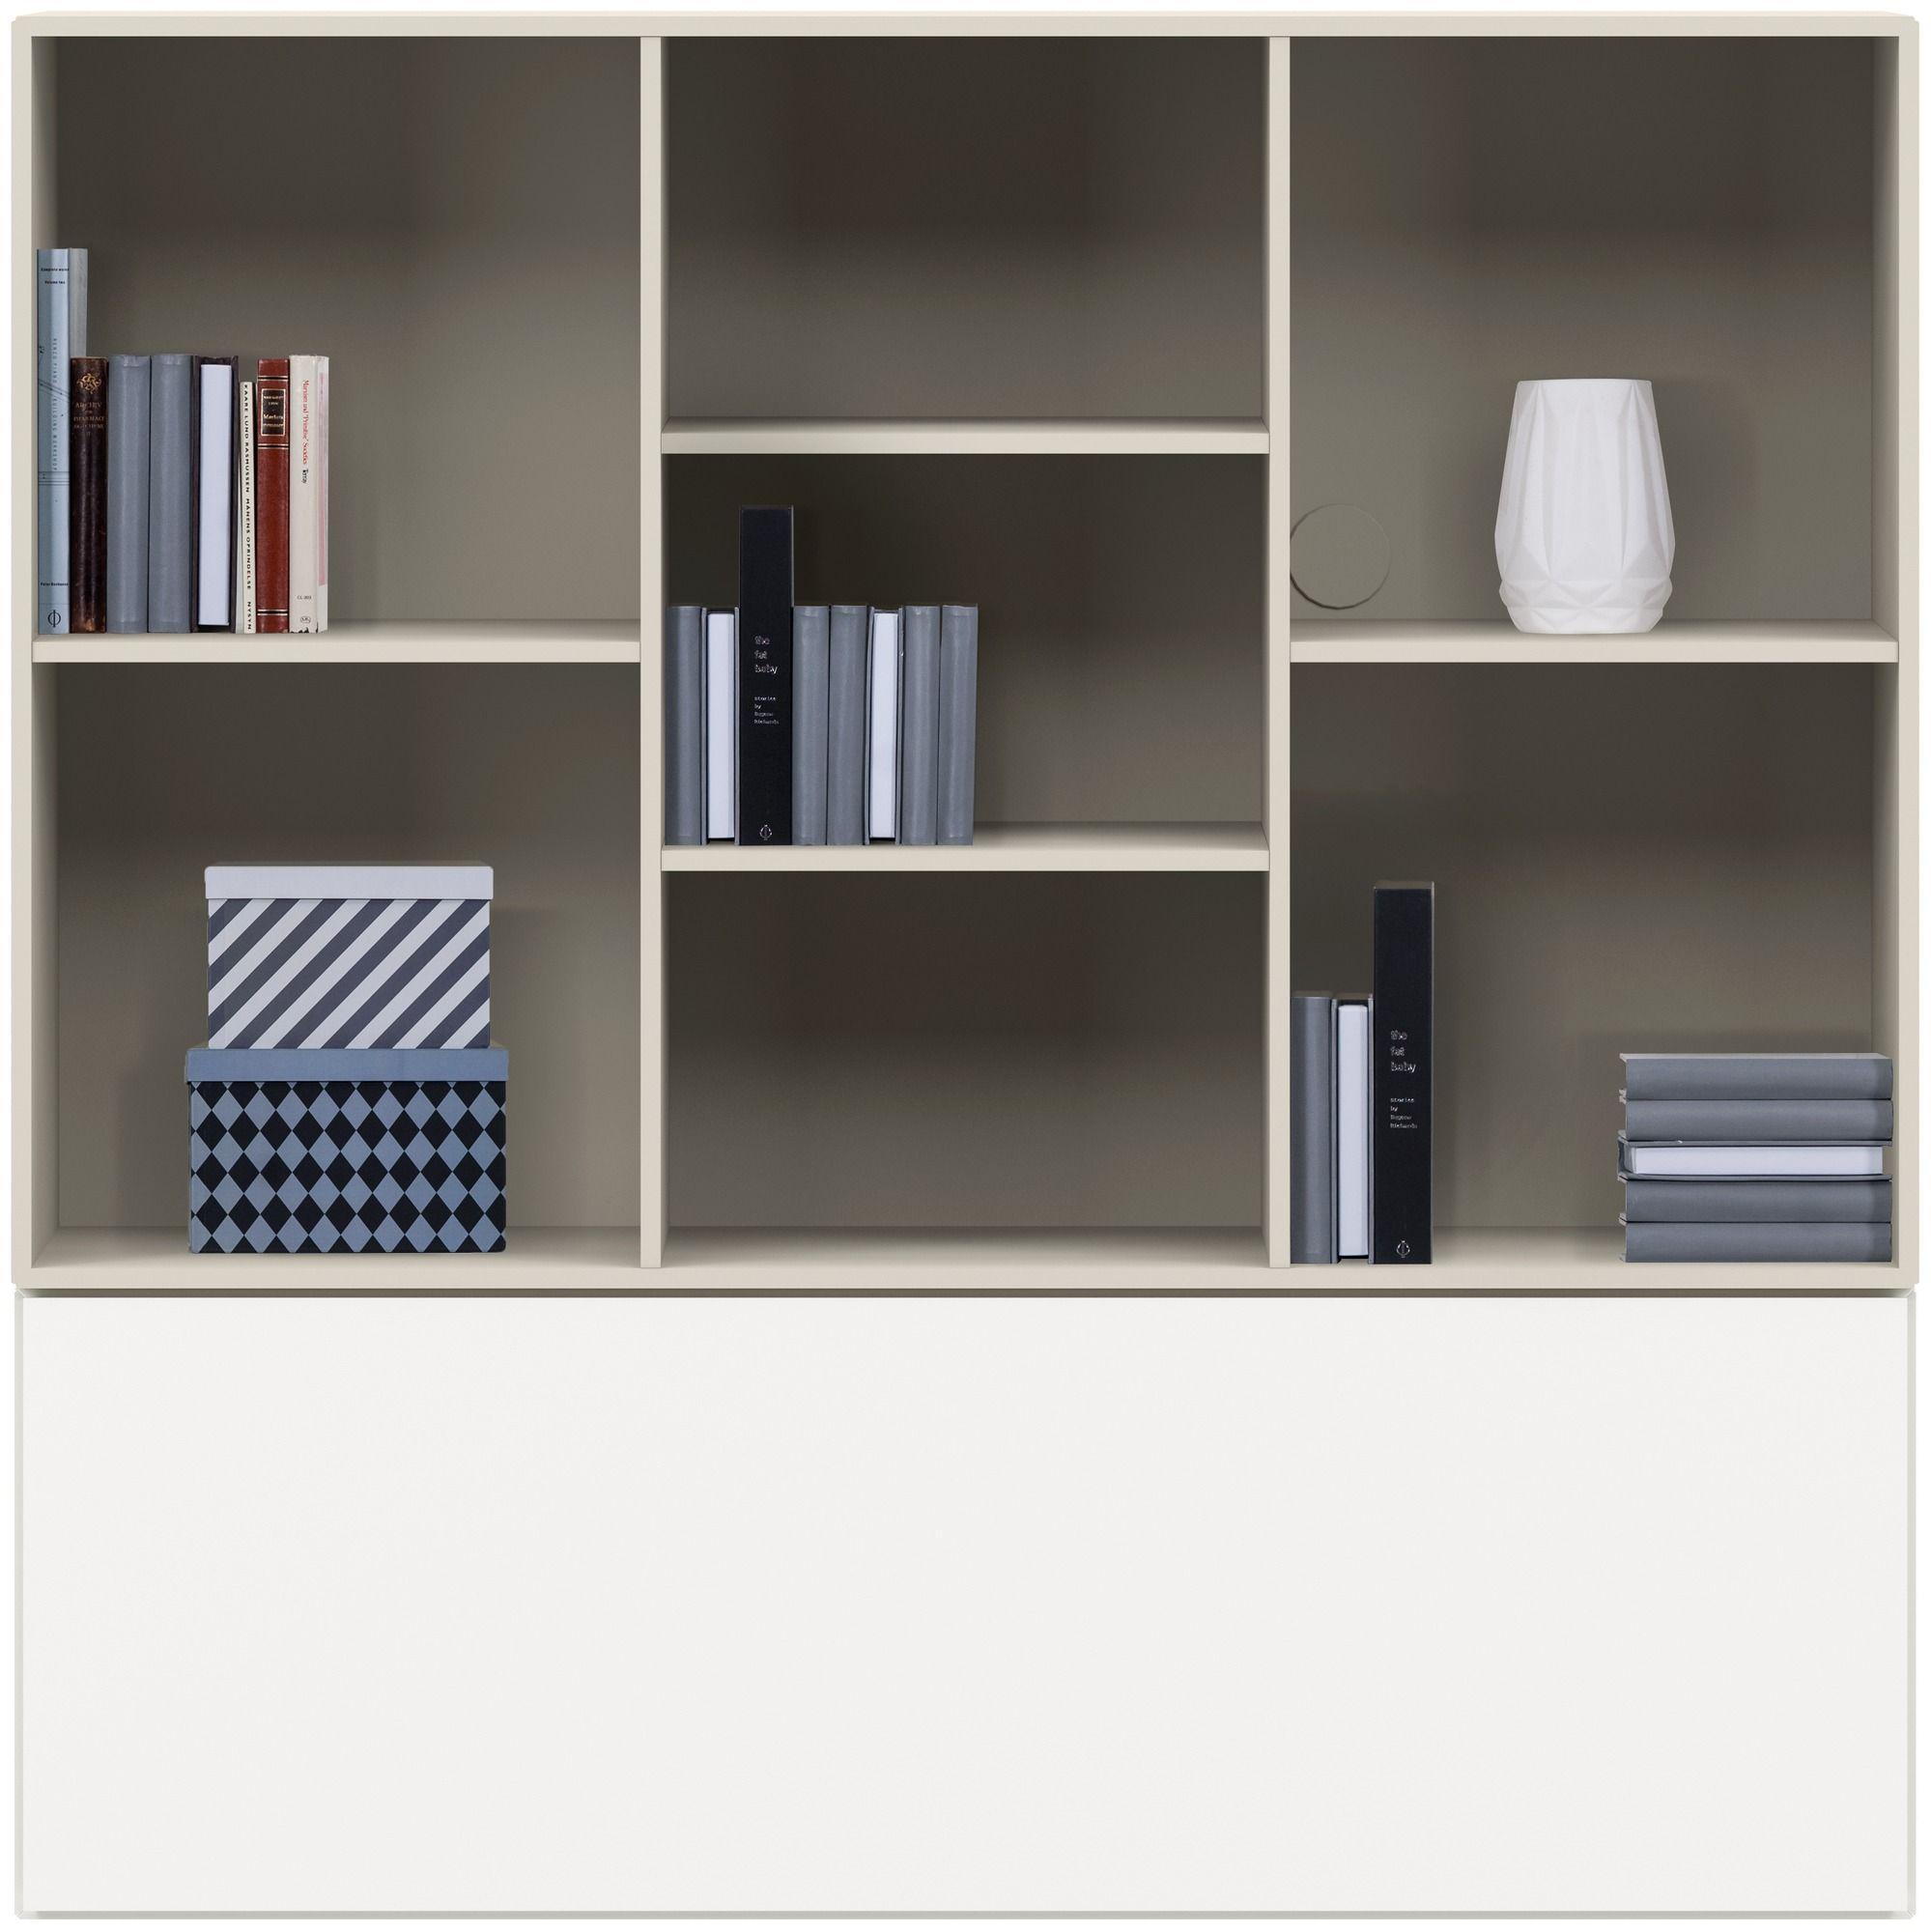 combinaisons murale lugano combinaisons murales et. Black Bedroom Furniture Sets. Home Design Ideas